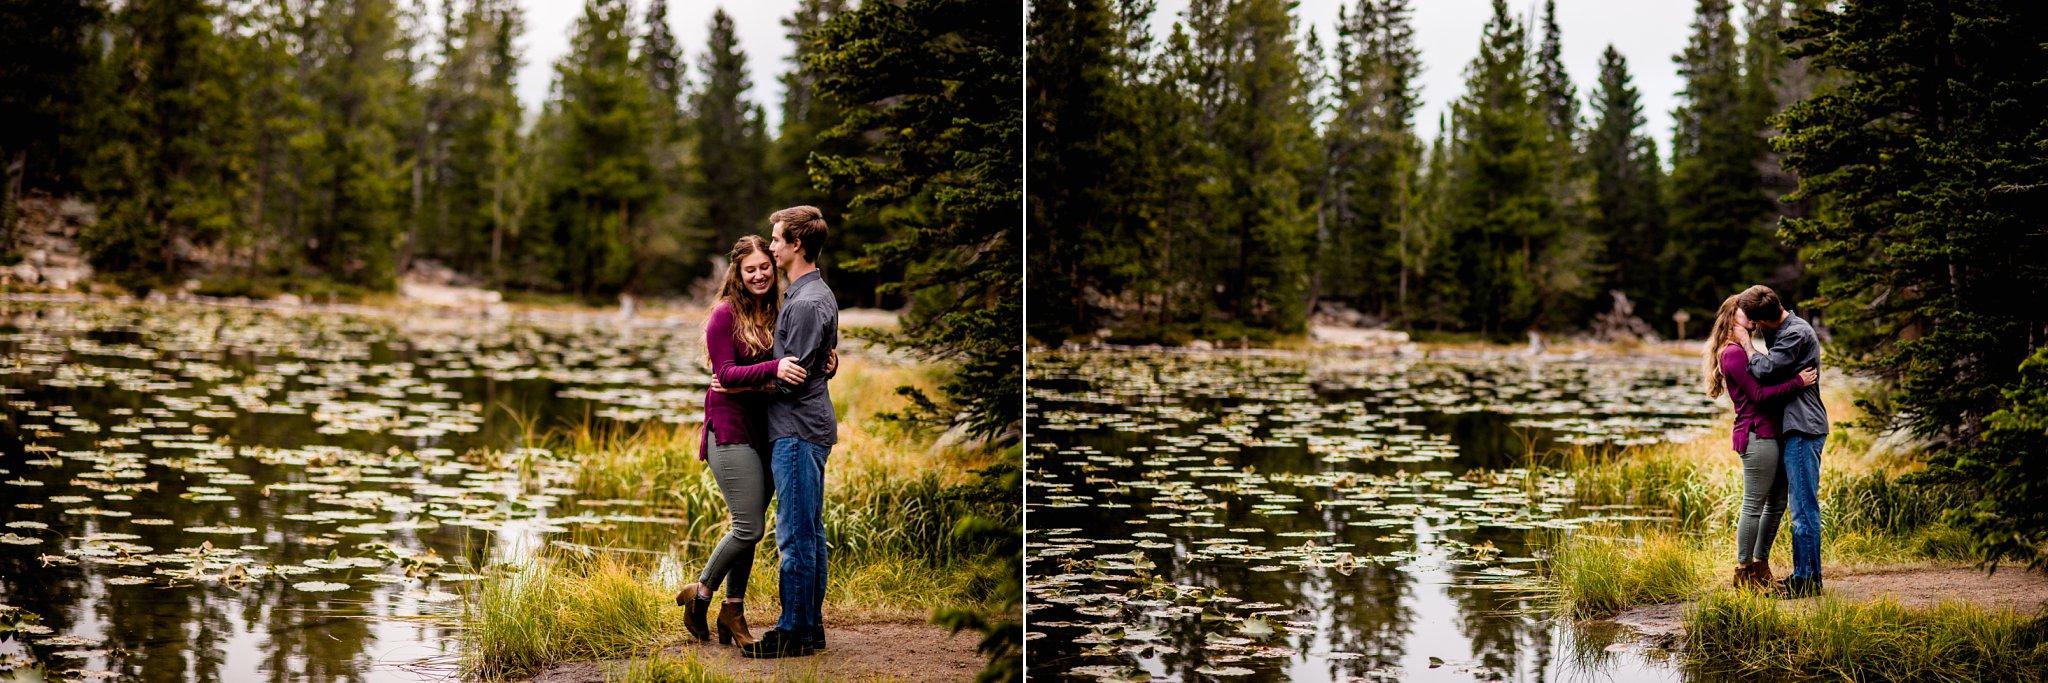 Rocky Mountain National Park Engagement Photos_0015.jpg